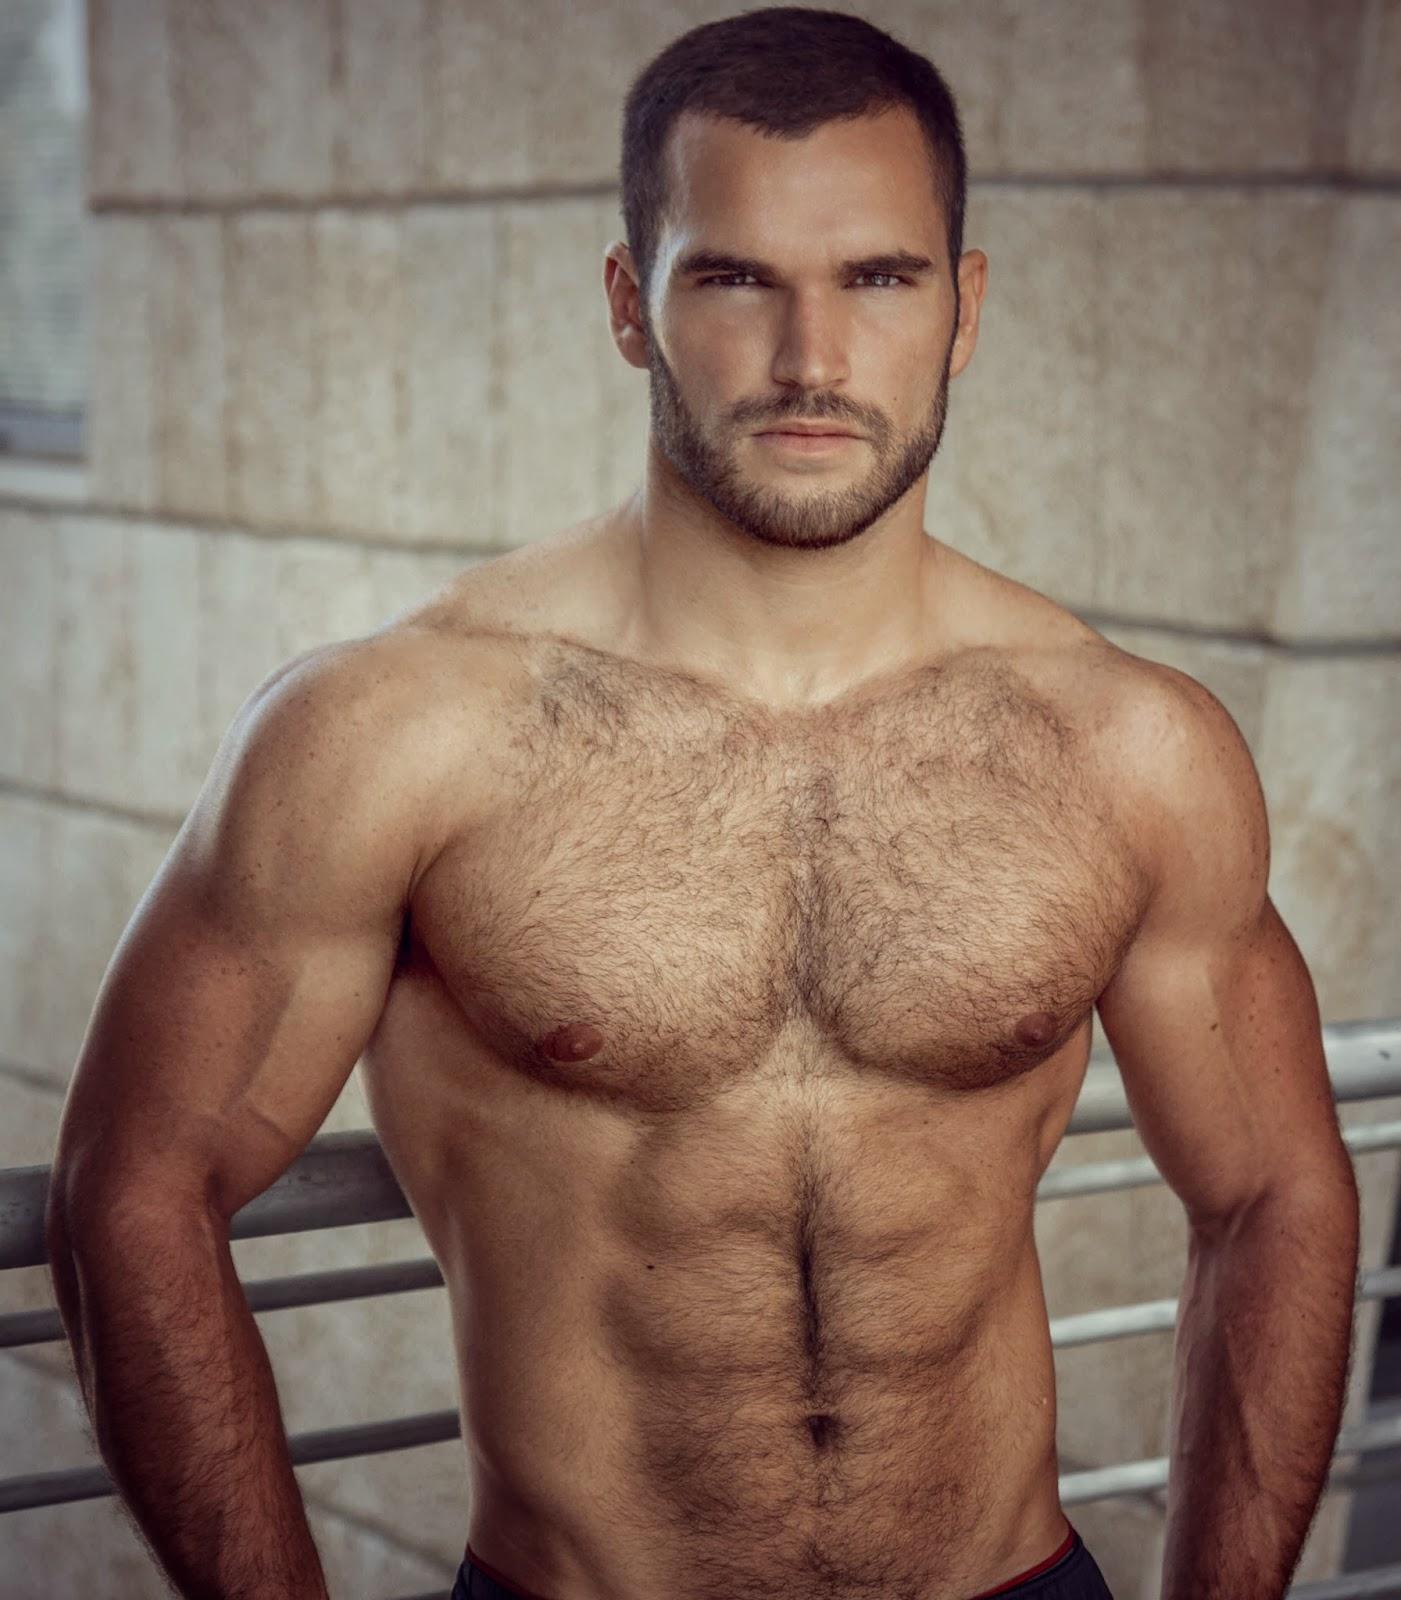 kevin sacre hairy chest jpg 853x1280